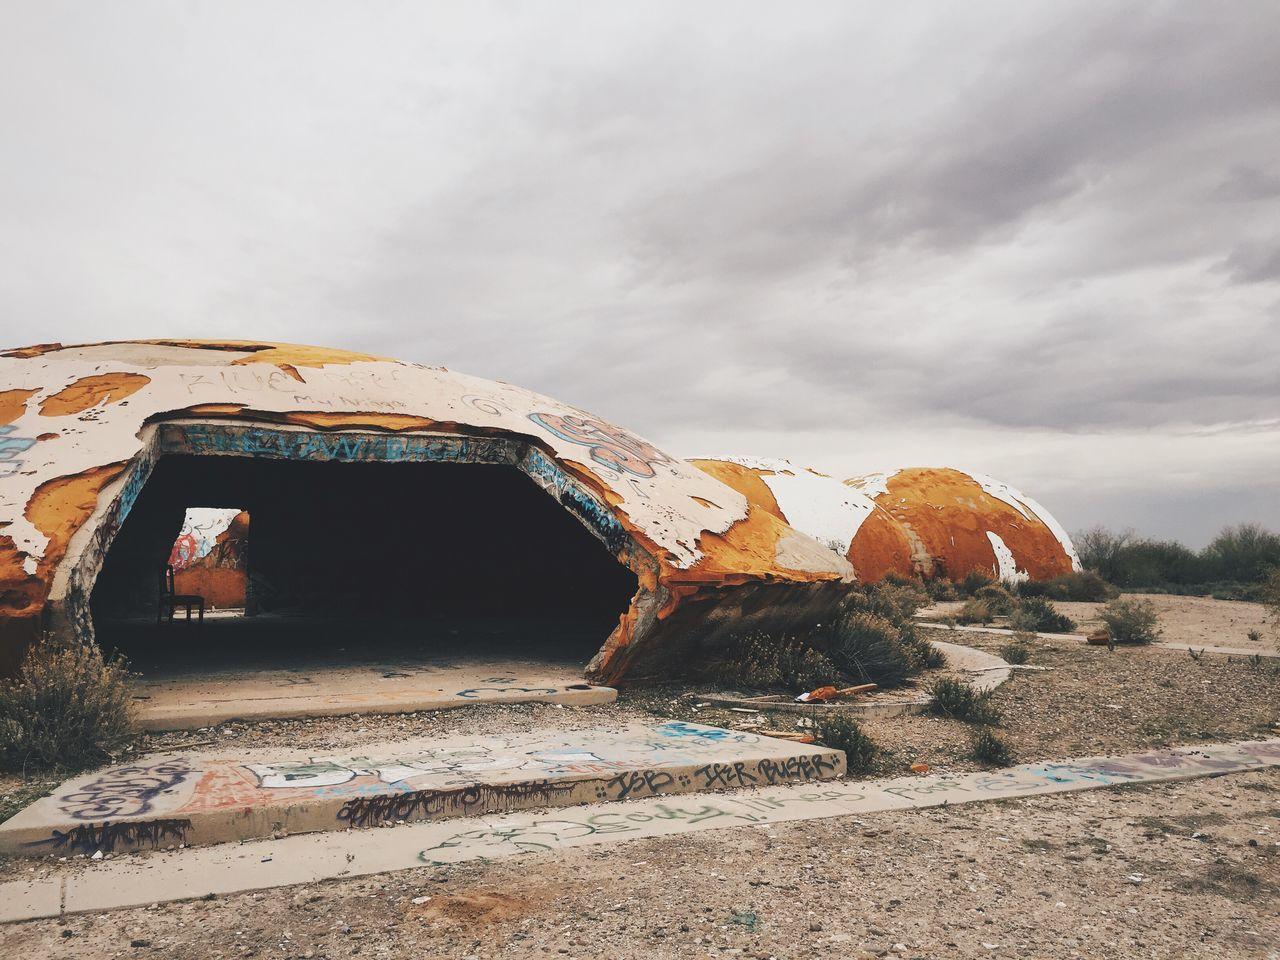 Domesday Dome Traveling Travel Roadtrip Desert Arizona Aliens Vscocam VSCO